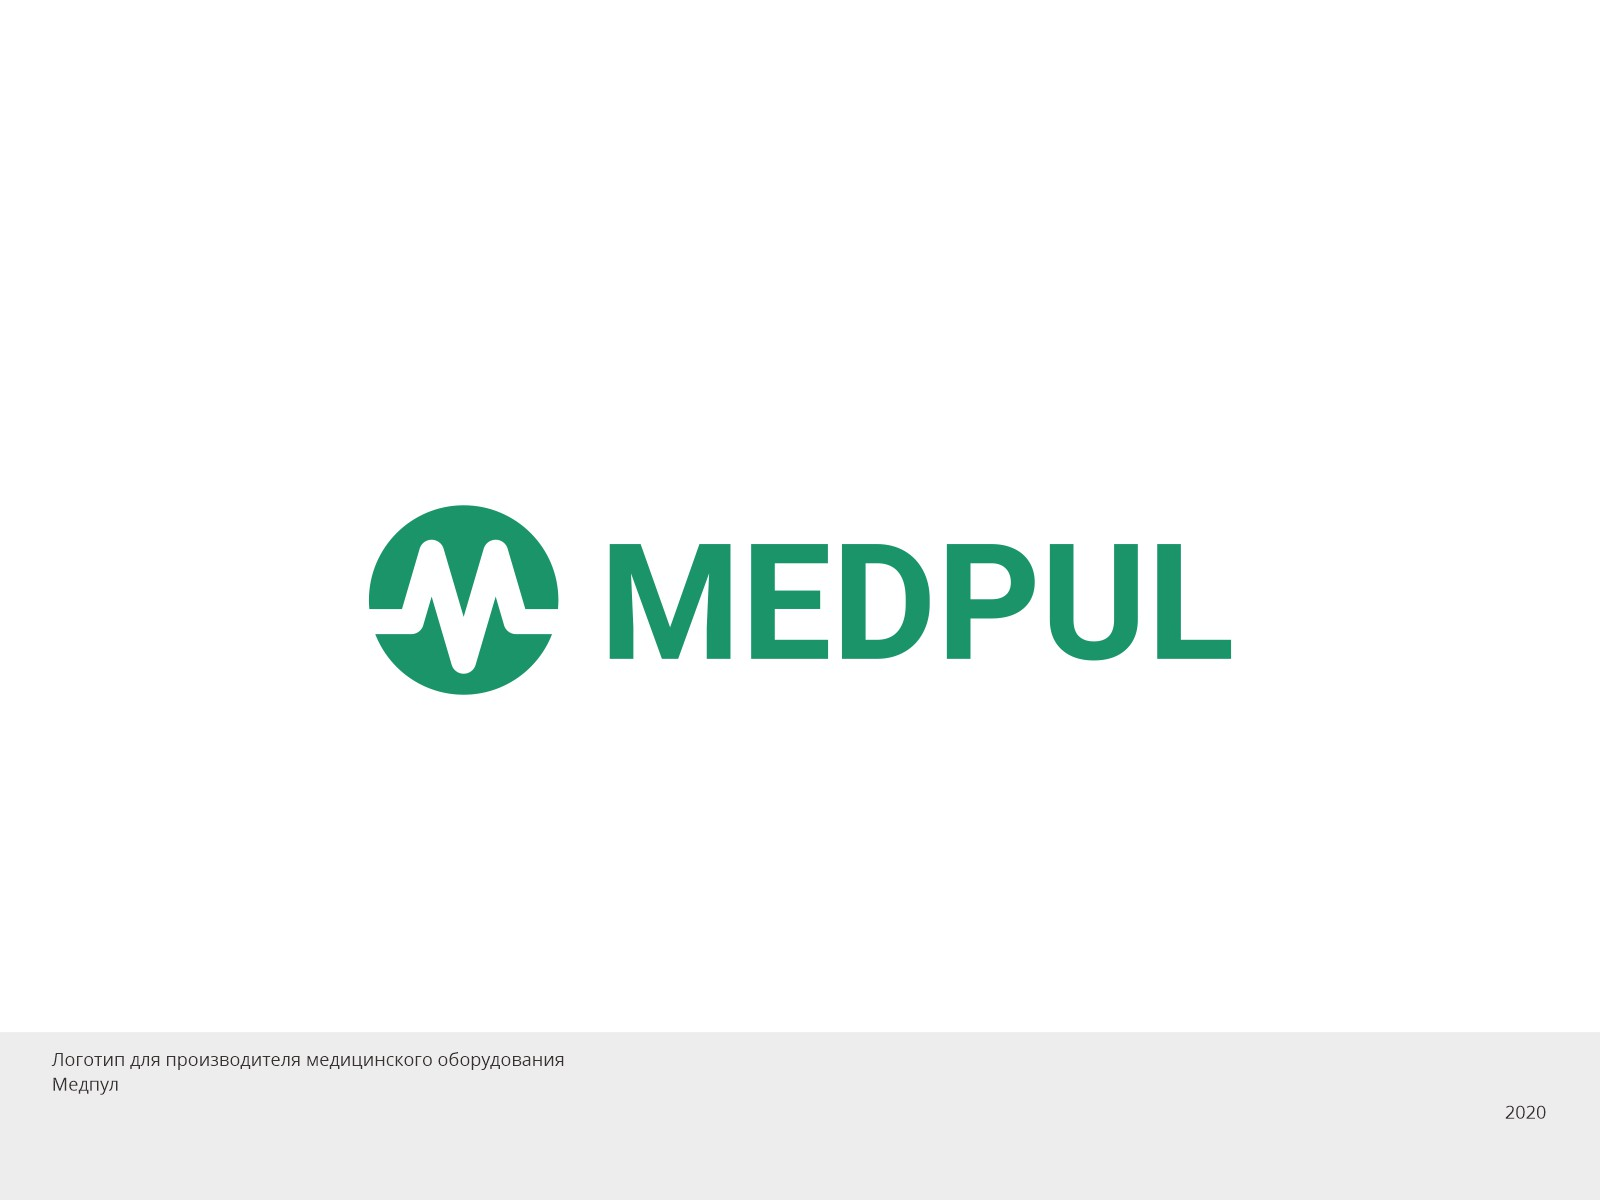 Логотип Медпул